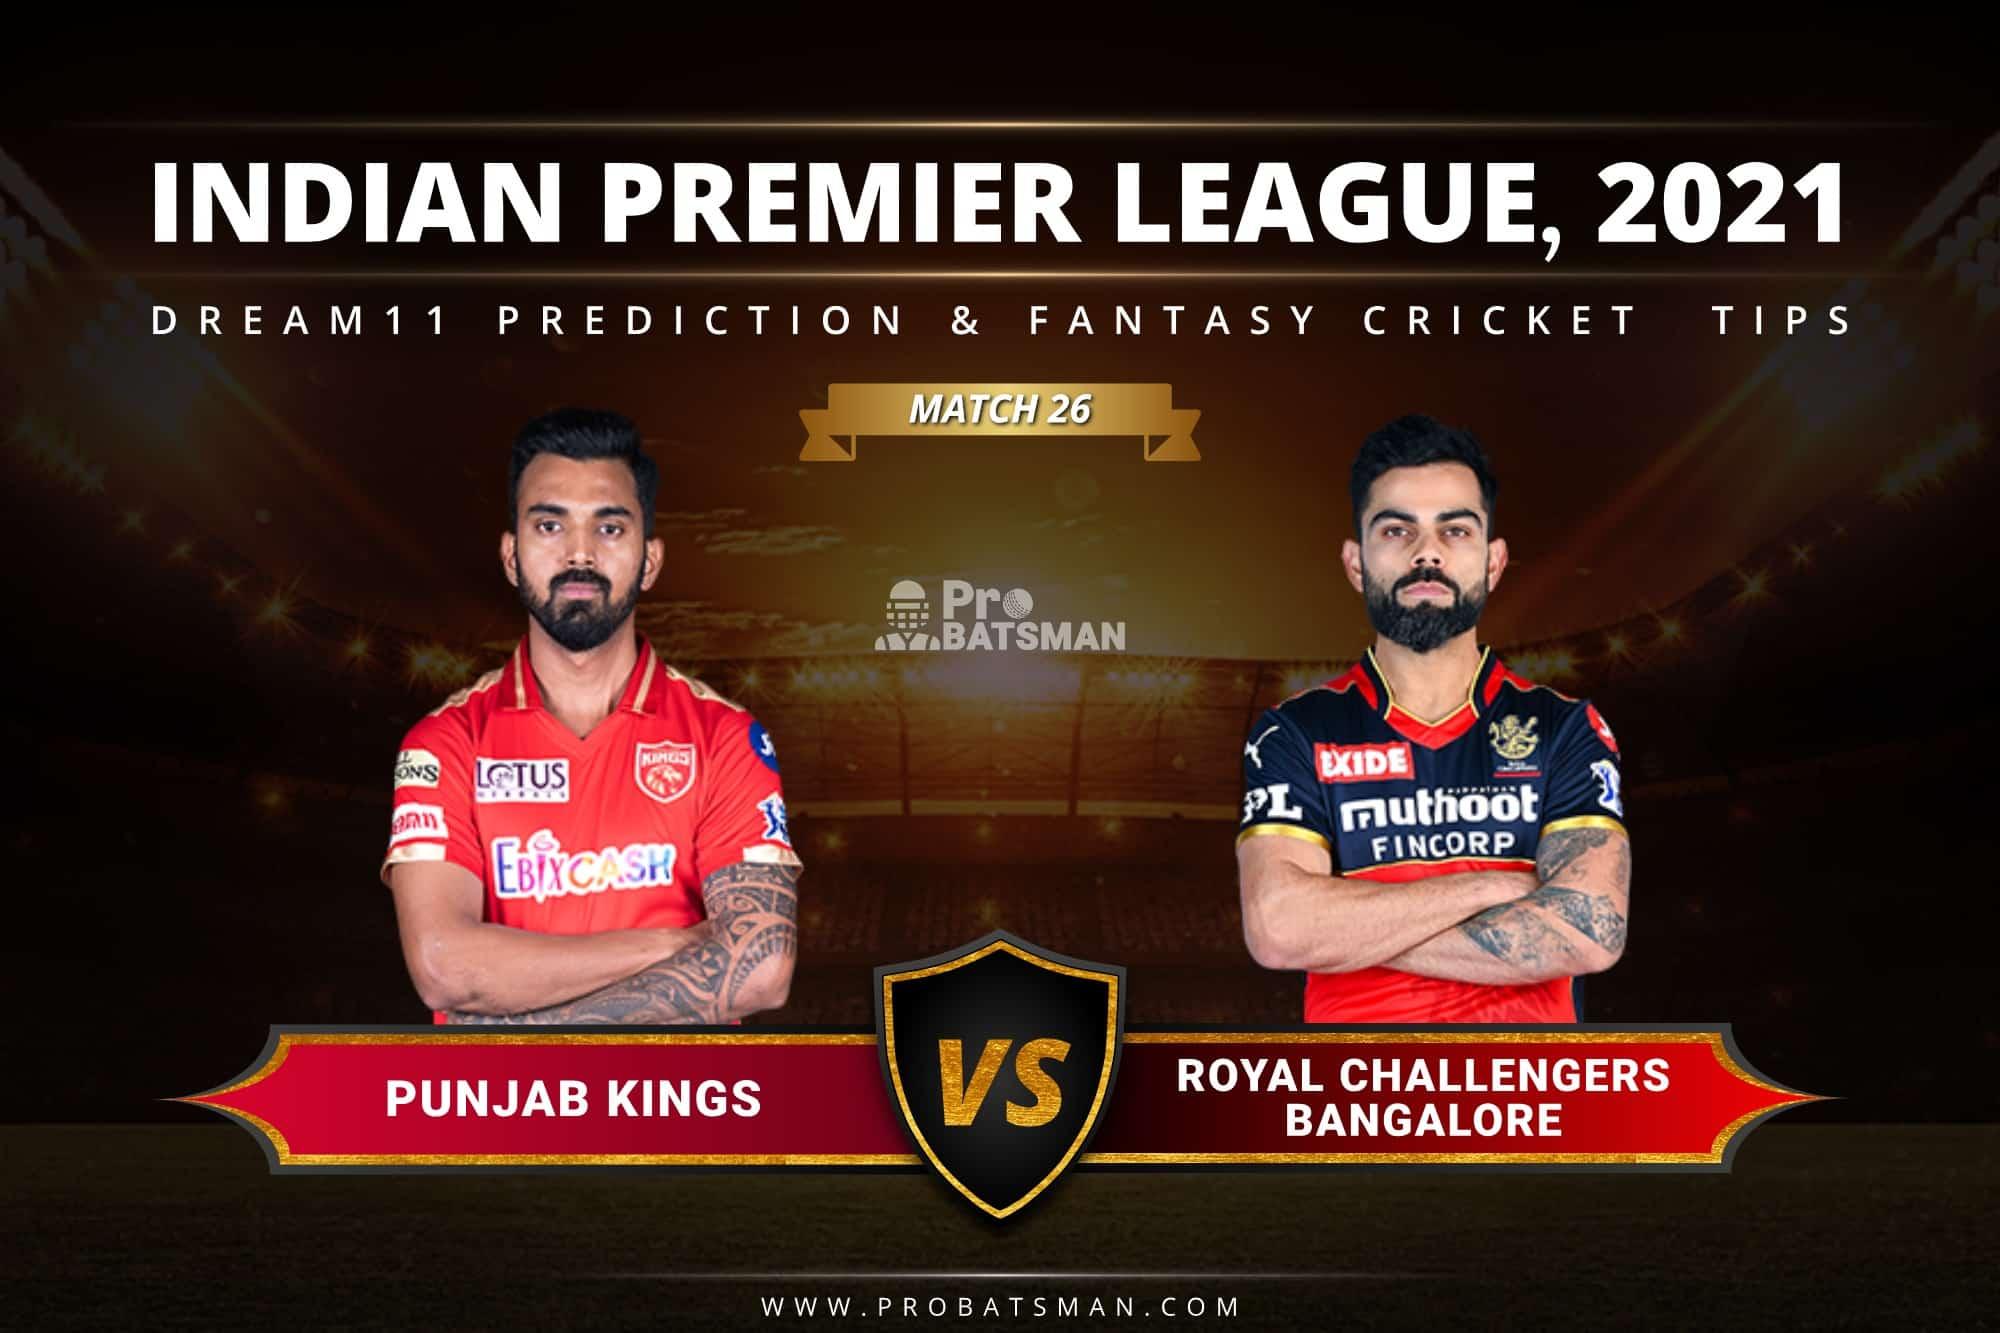 PBKS vs RCB Dream11 Prediction: Fantasy Cricket Tips, Playing XI, Pitch Report, Stats & Injury Updates of Match 26, IPL 2021